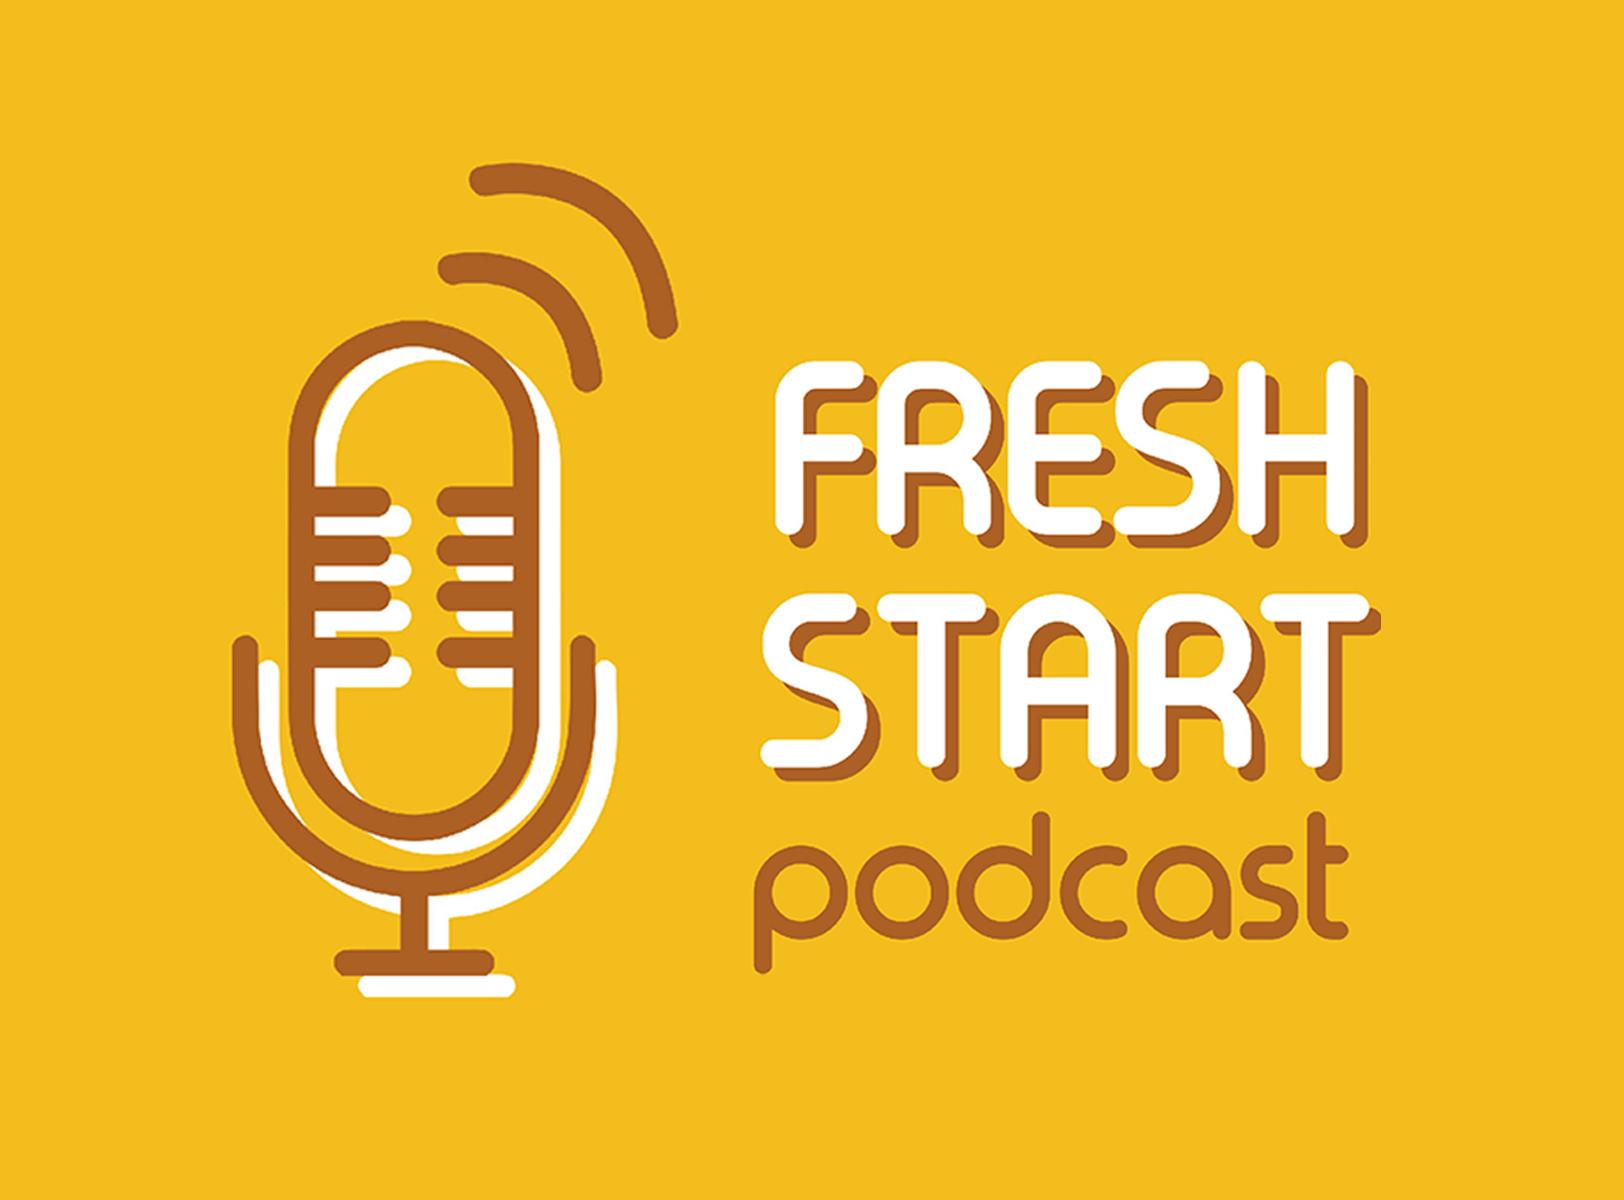 Fresh Start: Podcast News (9/10/2019 Tue.)